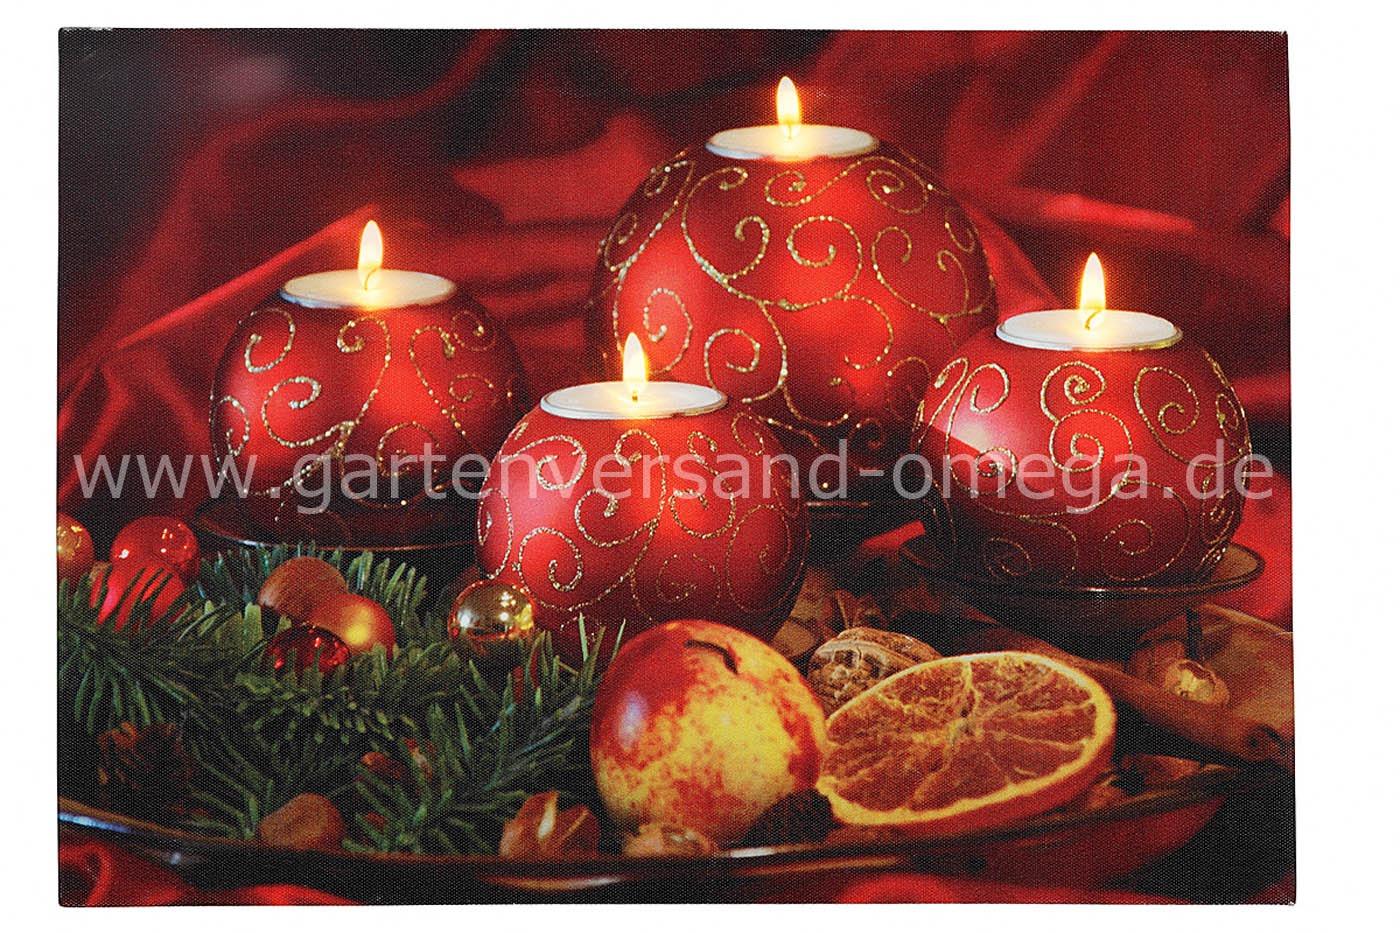 led bild motiv weihnachtskerzen weihnachtsbeleuchtung weihnachtstrend led dekoration led. Black Bedroom Furniture Sets. Home Design Ideas